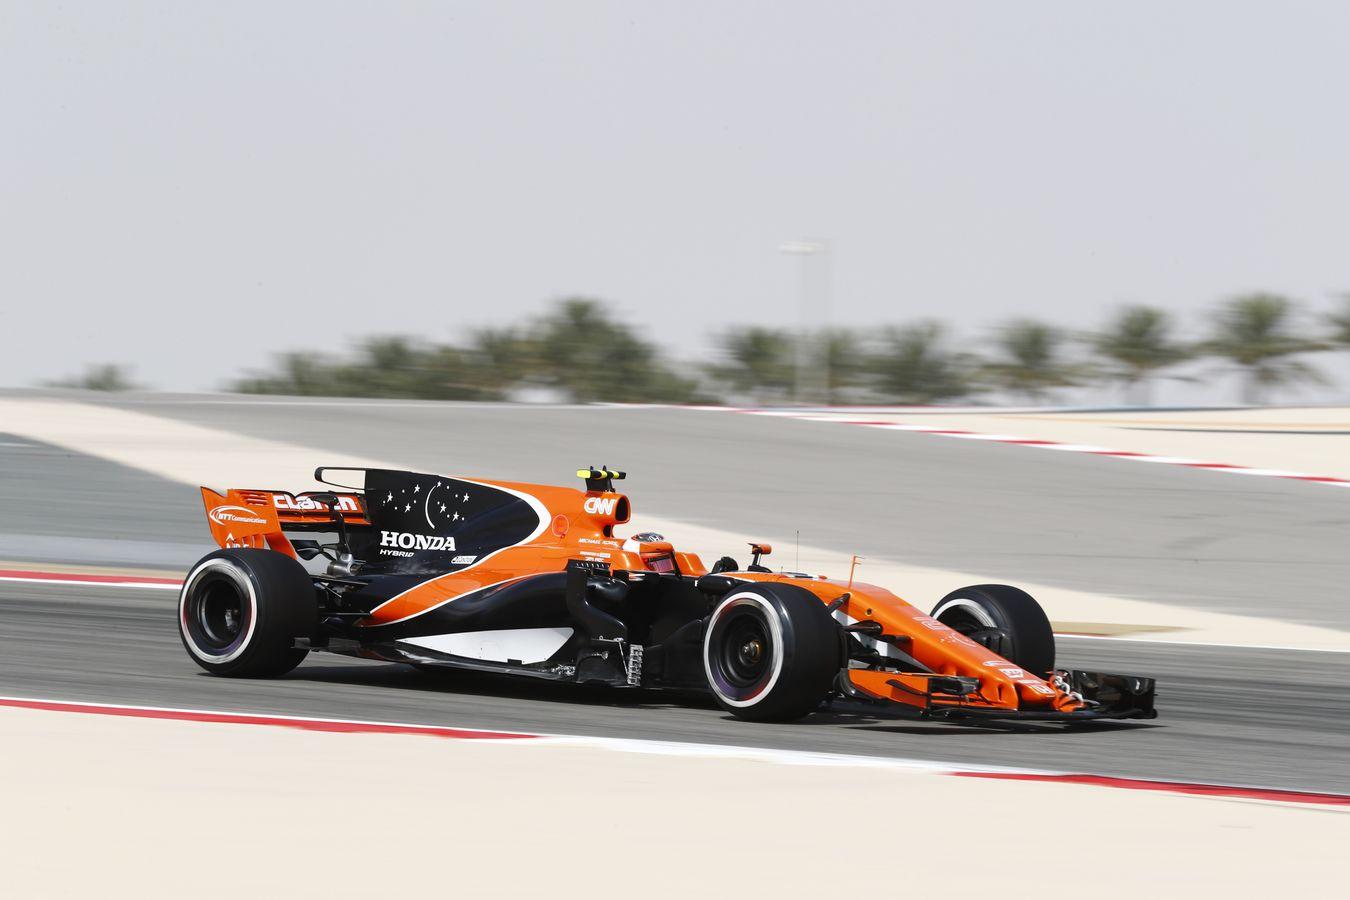 mclaren formula 1 - 2017 bahrain grand prix - free practice